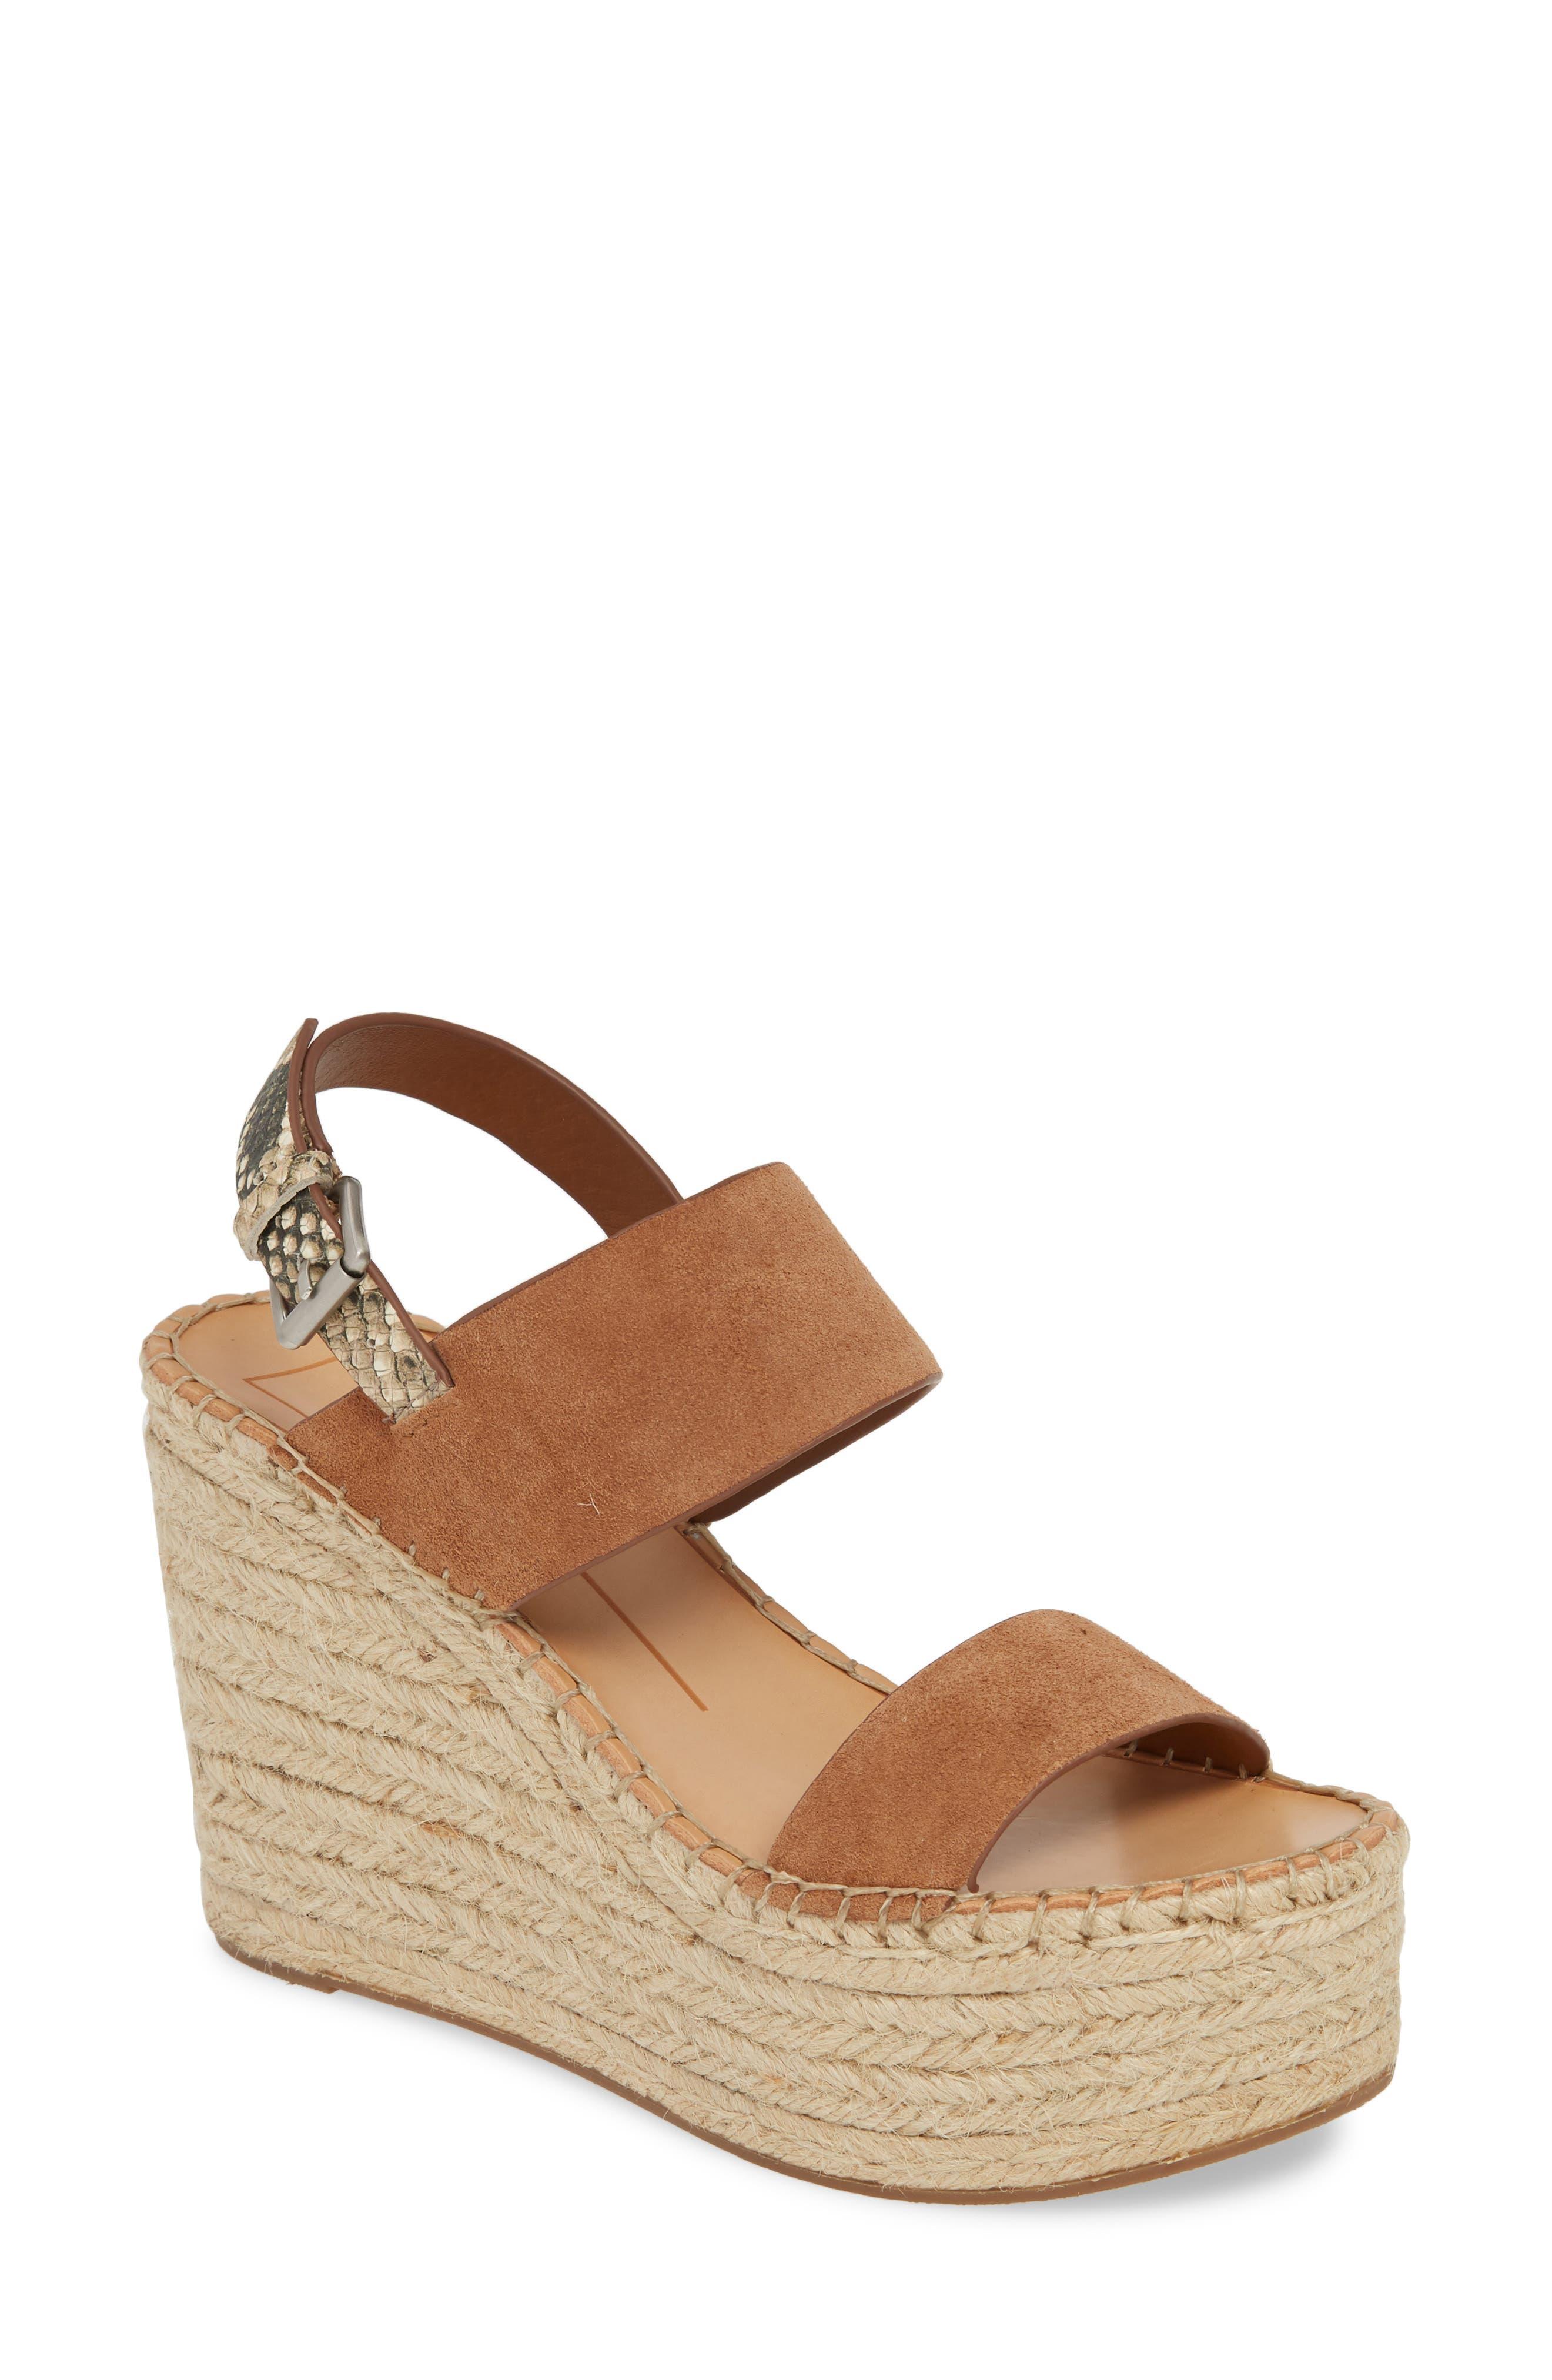 Spiro Platform Wedge Sandal, Main, color, BROWN SUEDE